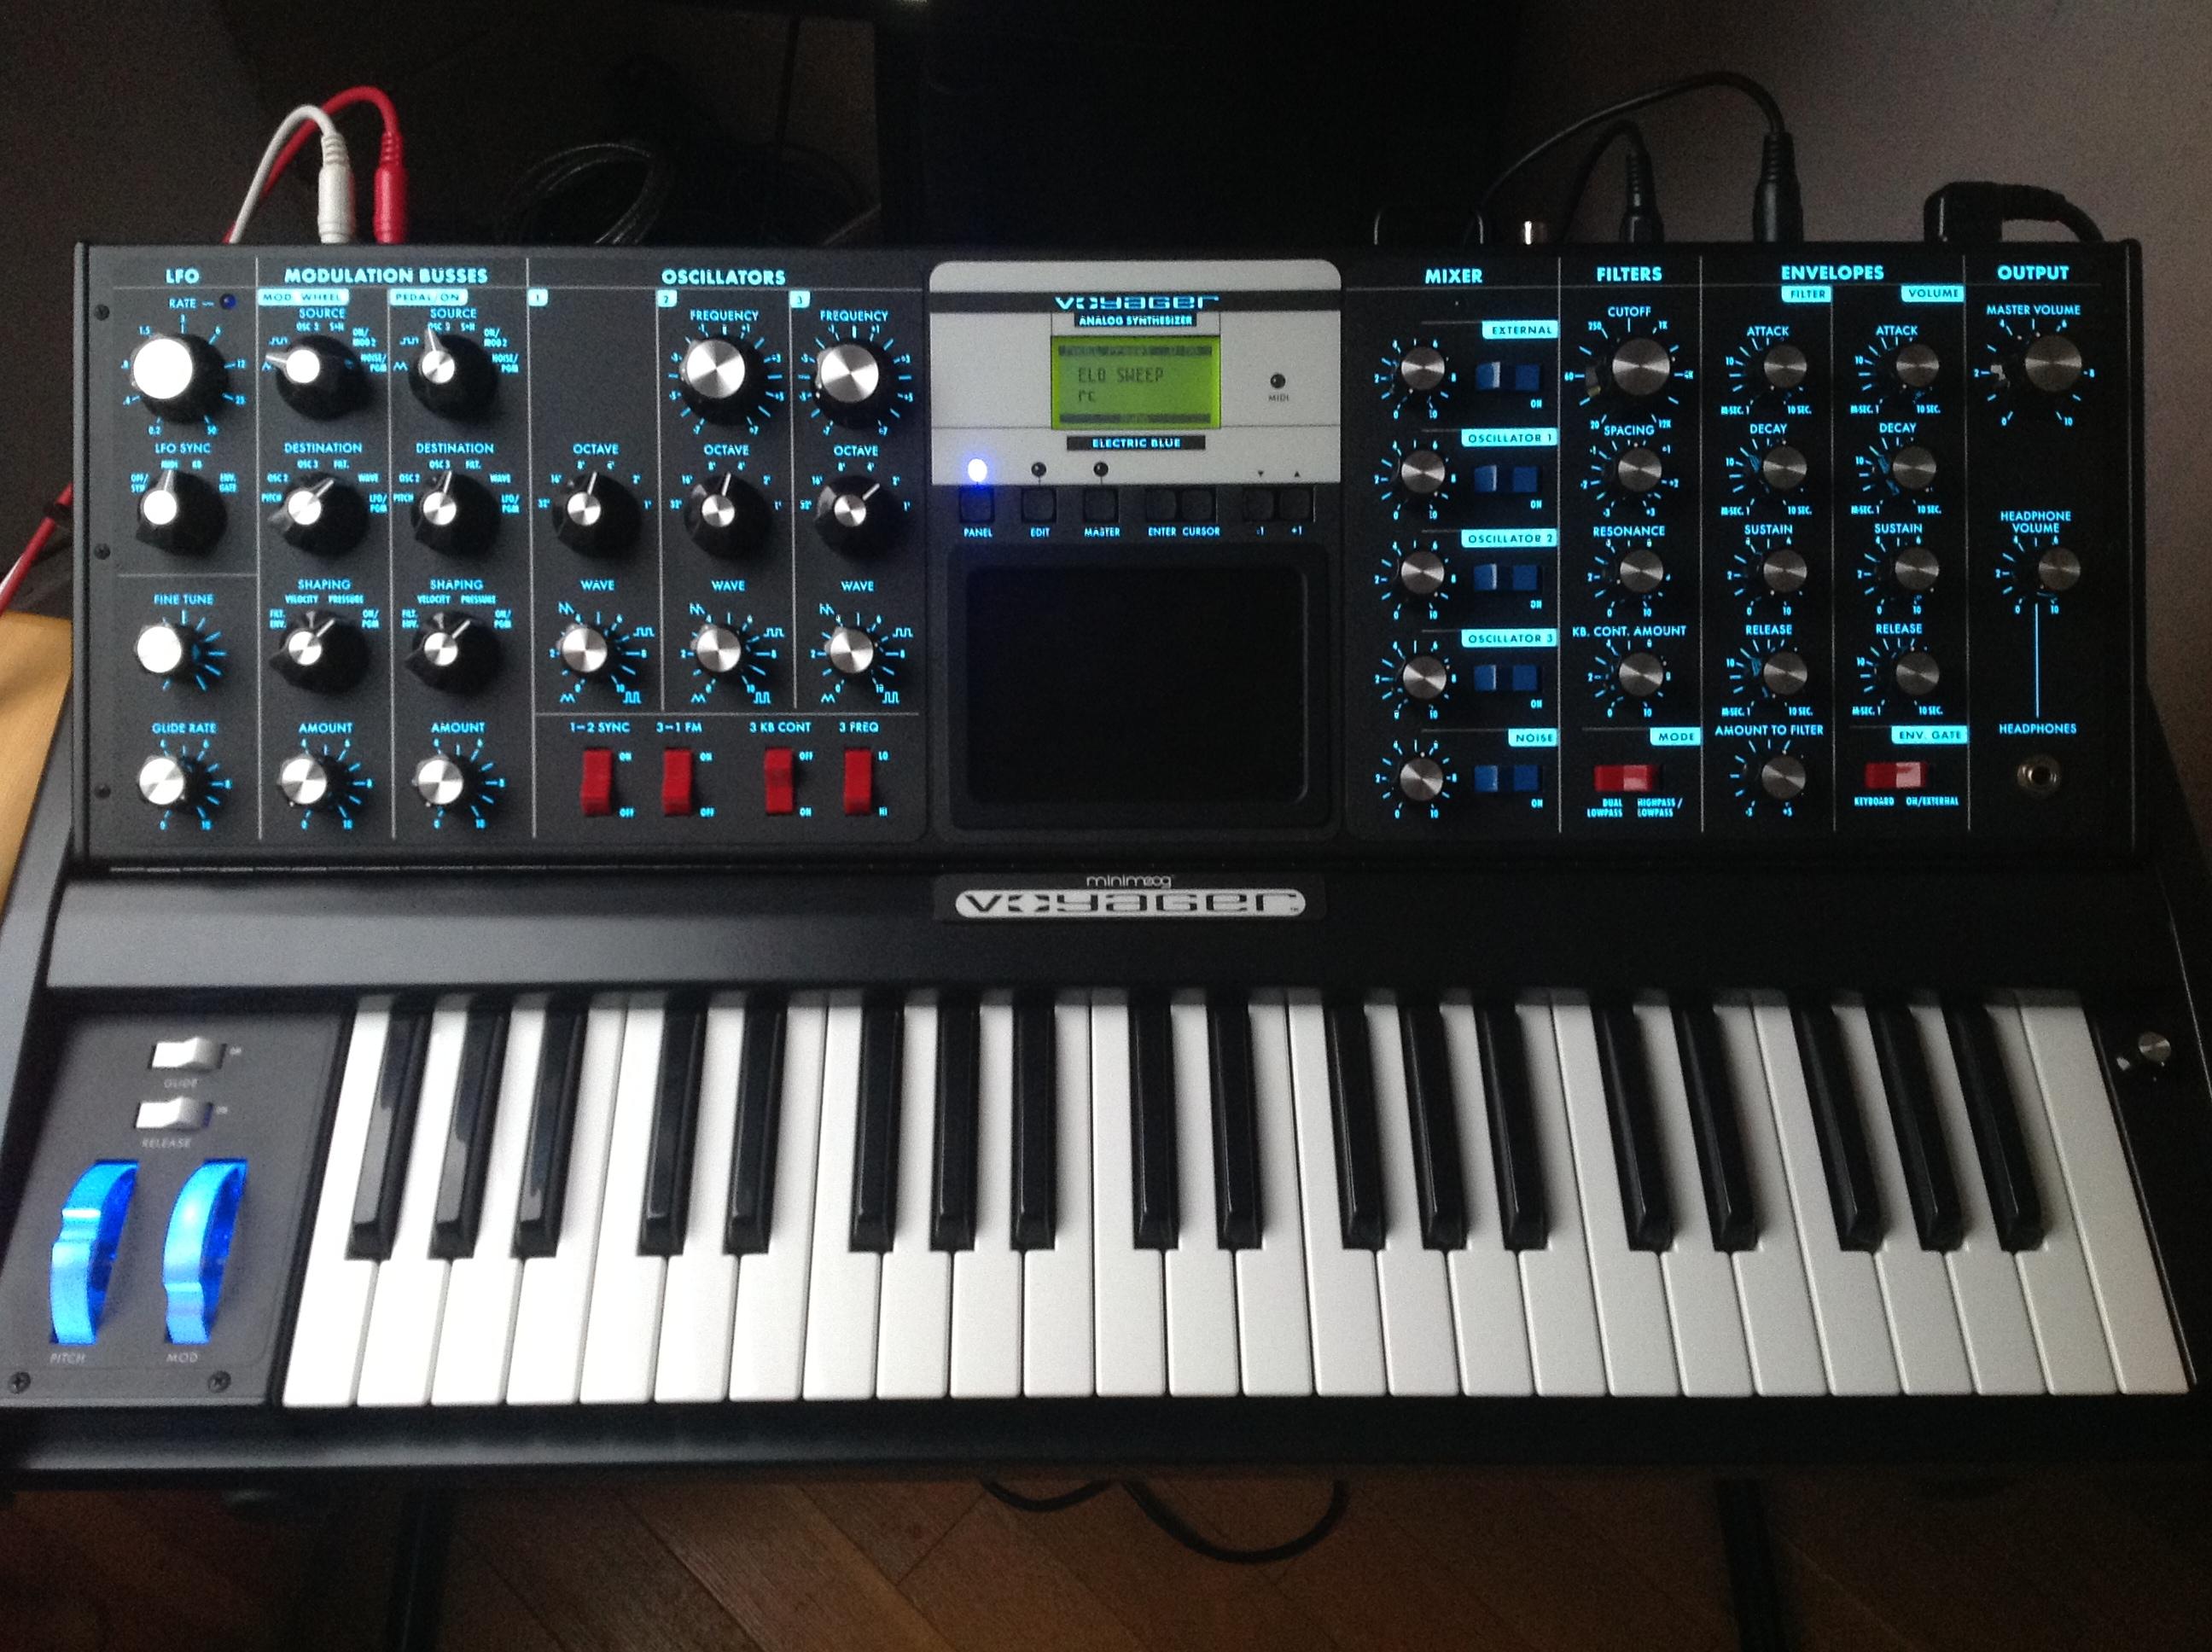 Moog Minimoog Voyager | Vintage Synth Explorer